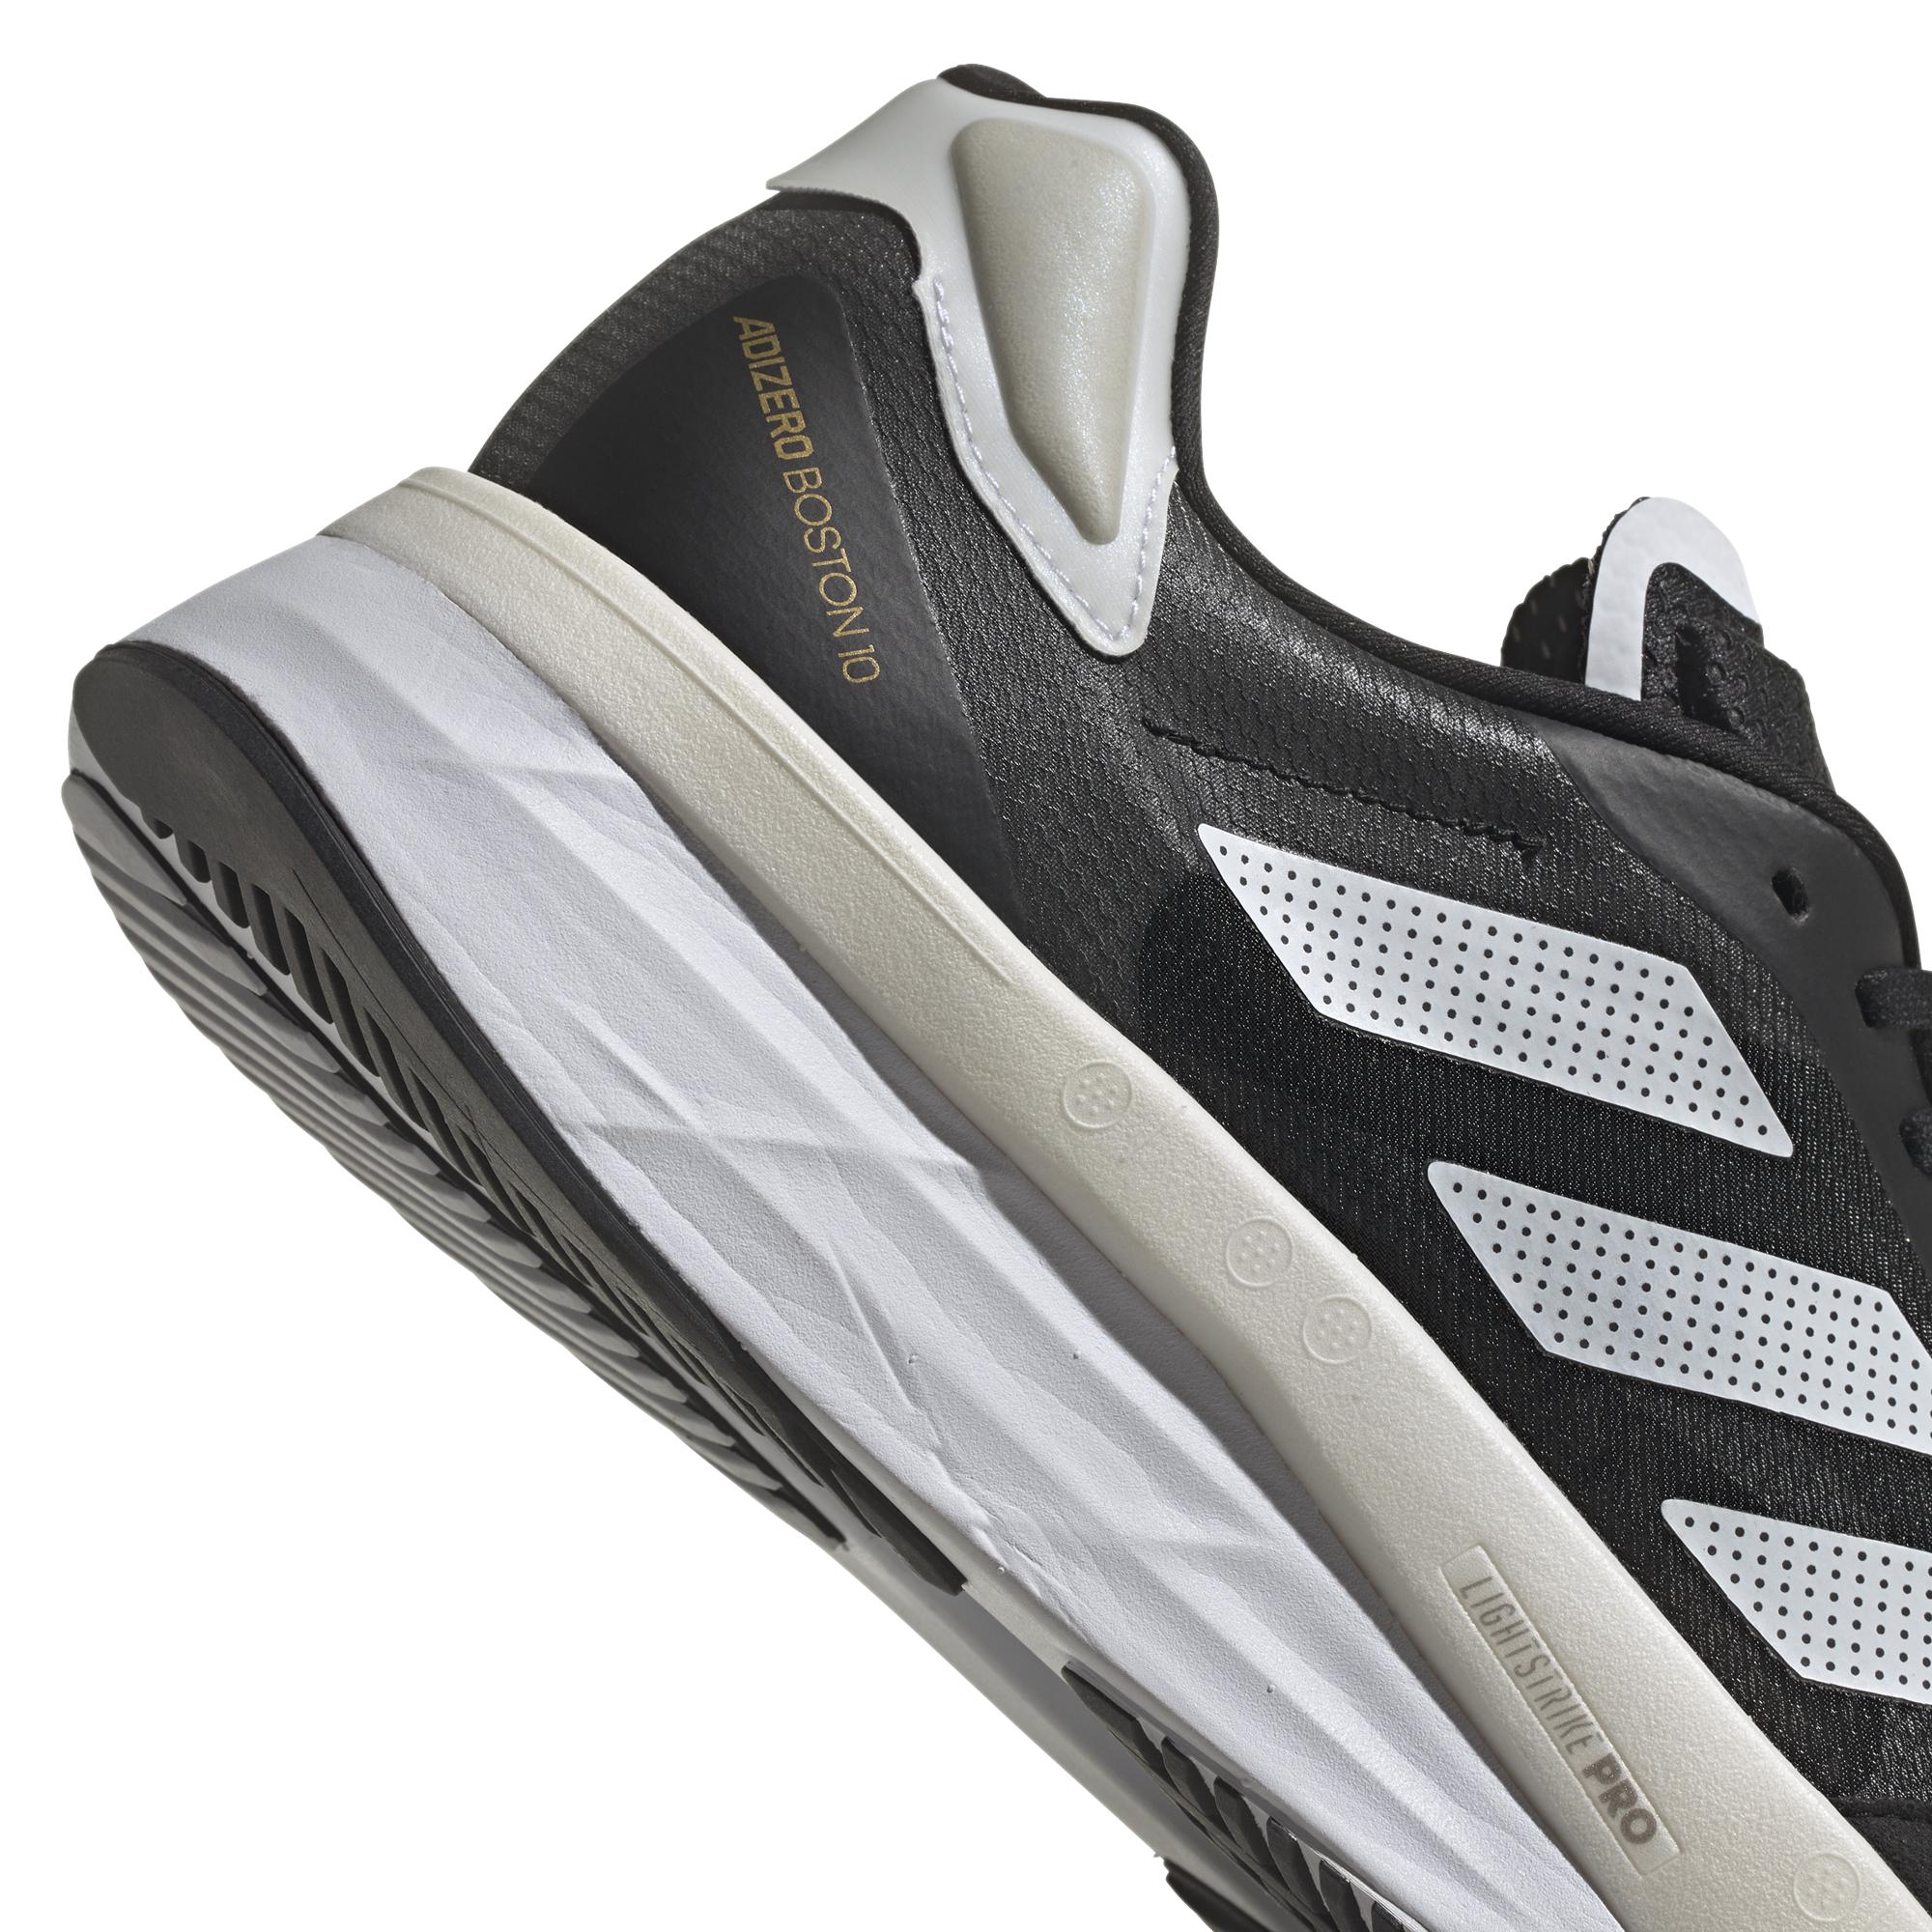 Men's Adidas Adizero Boston 10 Running Shoe - Color: Core Black / Cloud White / Gold Metallic - Size: 6.5 - Width: Regular, Core Black / Cloud White / Gold Metallic, large, image 7